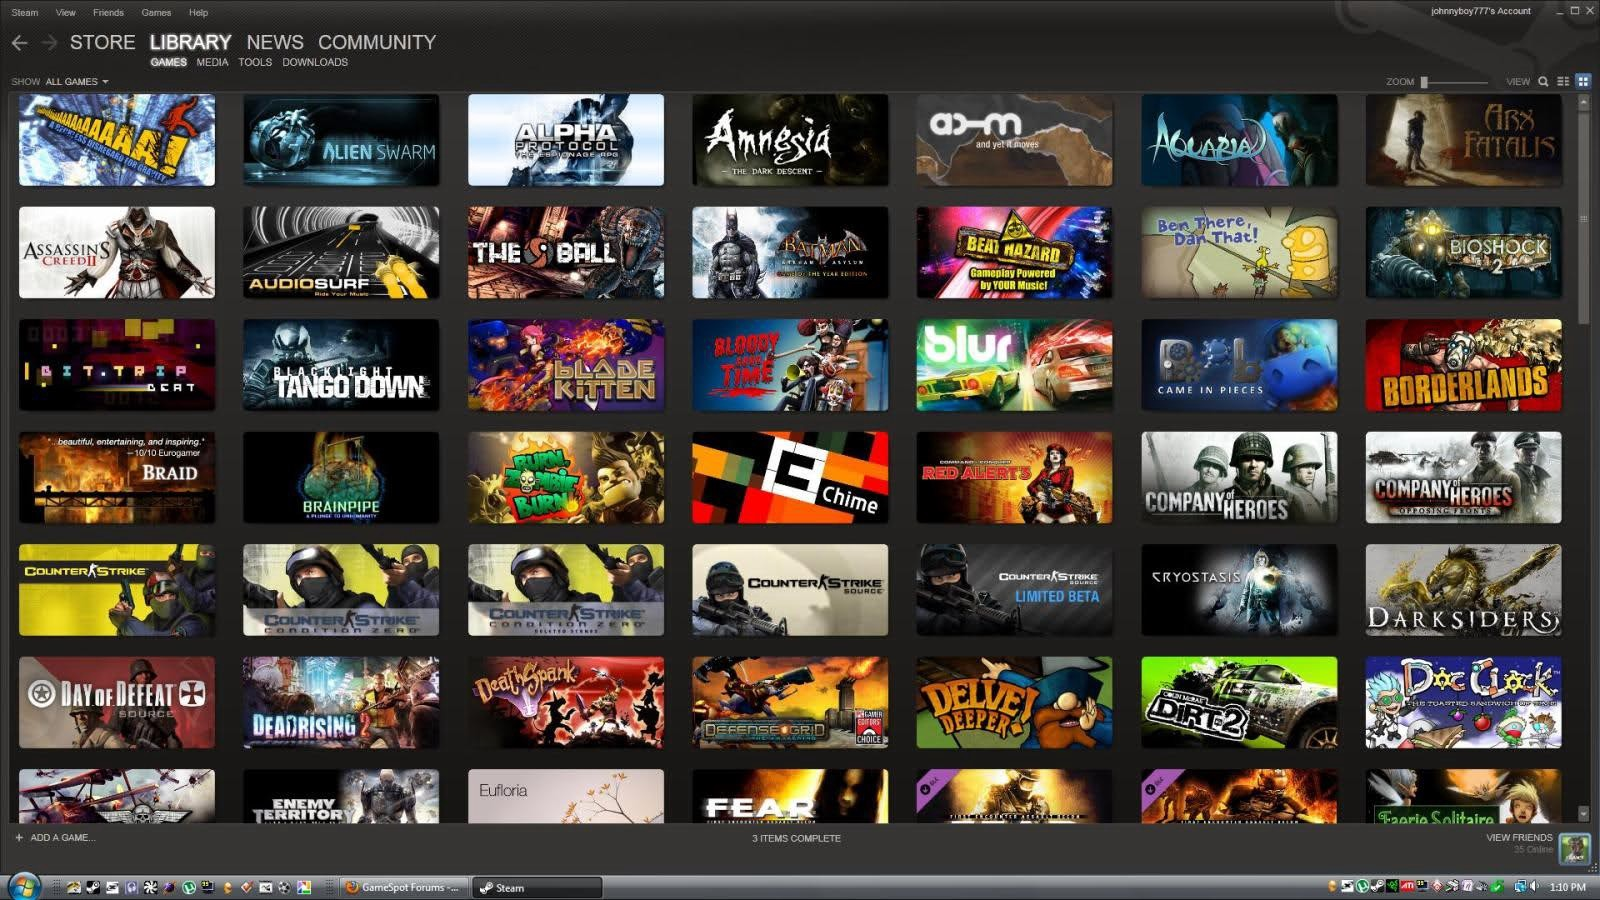 Random сборник Steam (от 30-50 игр)